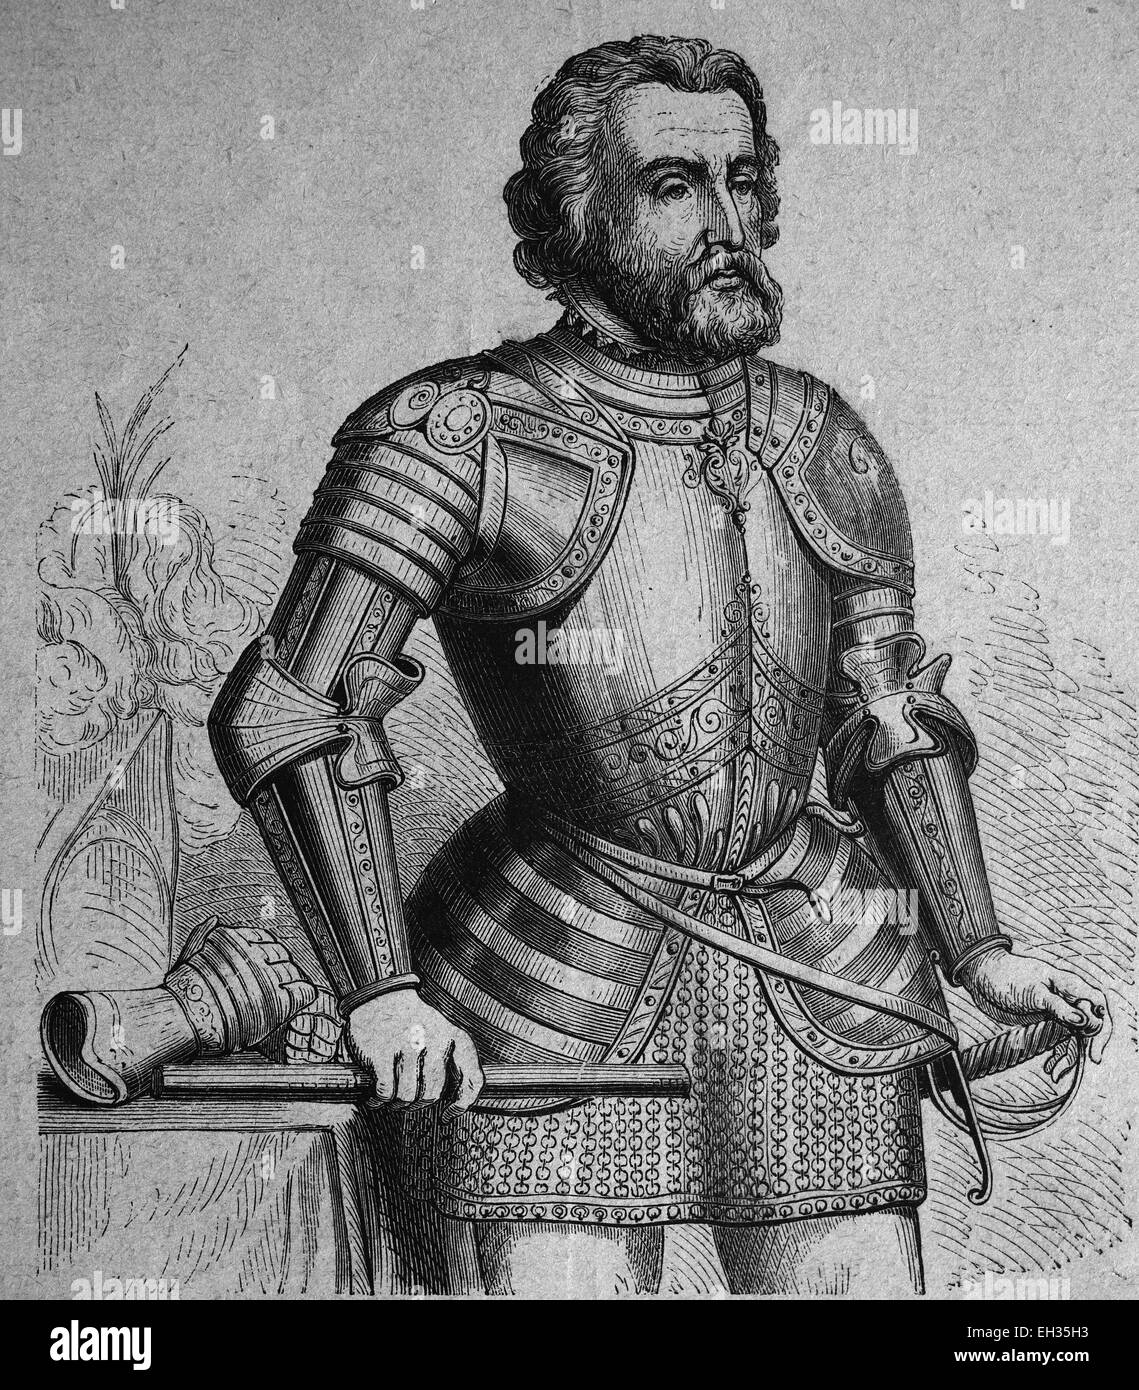 Ferdinand Cortez, explorer of Mexico and conqueror of New Spain, woodcut 1888 - Stock Image